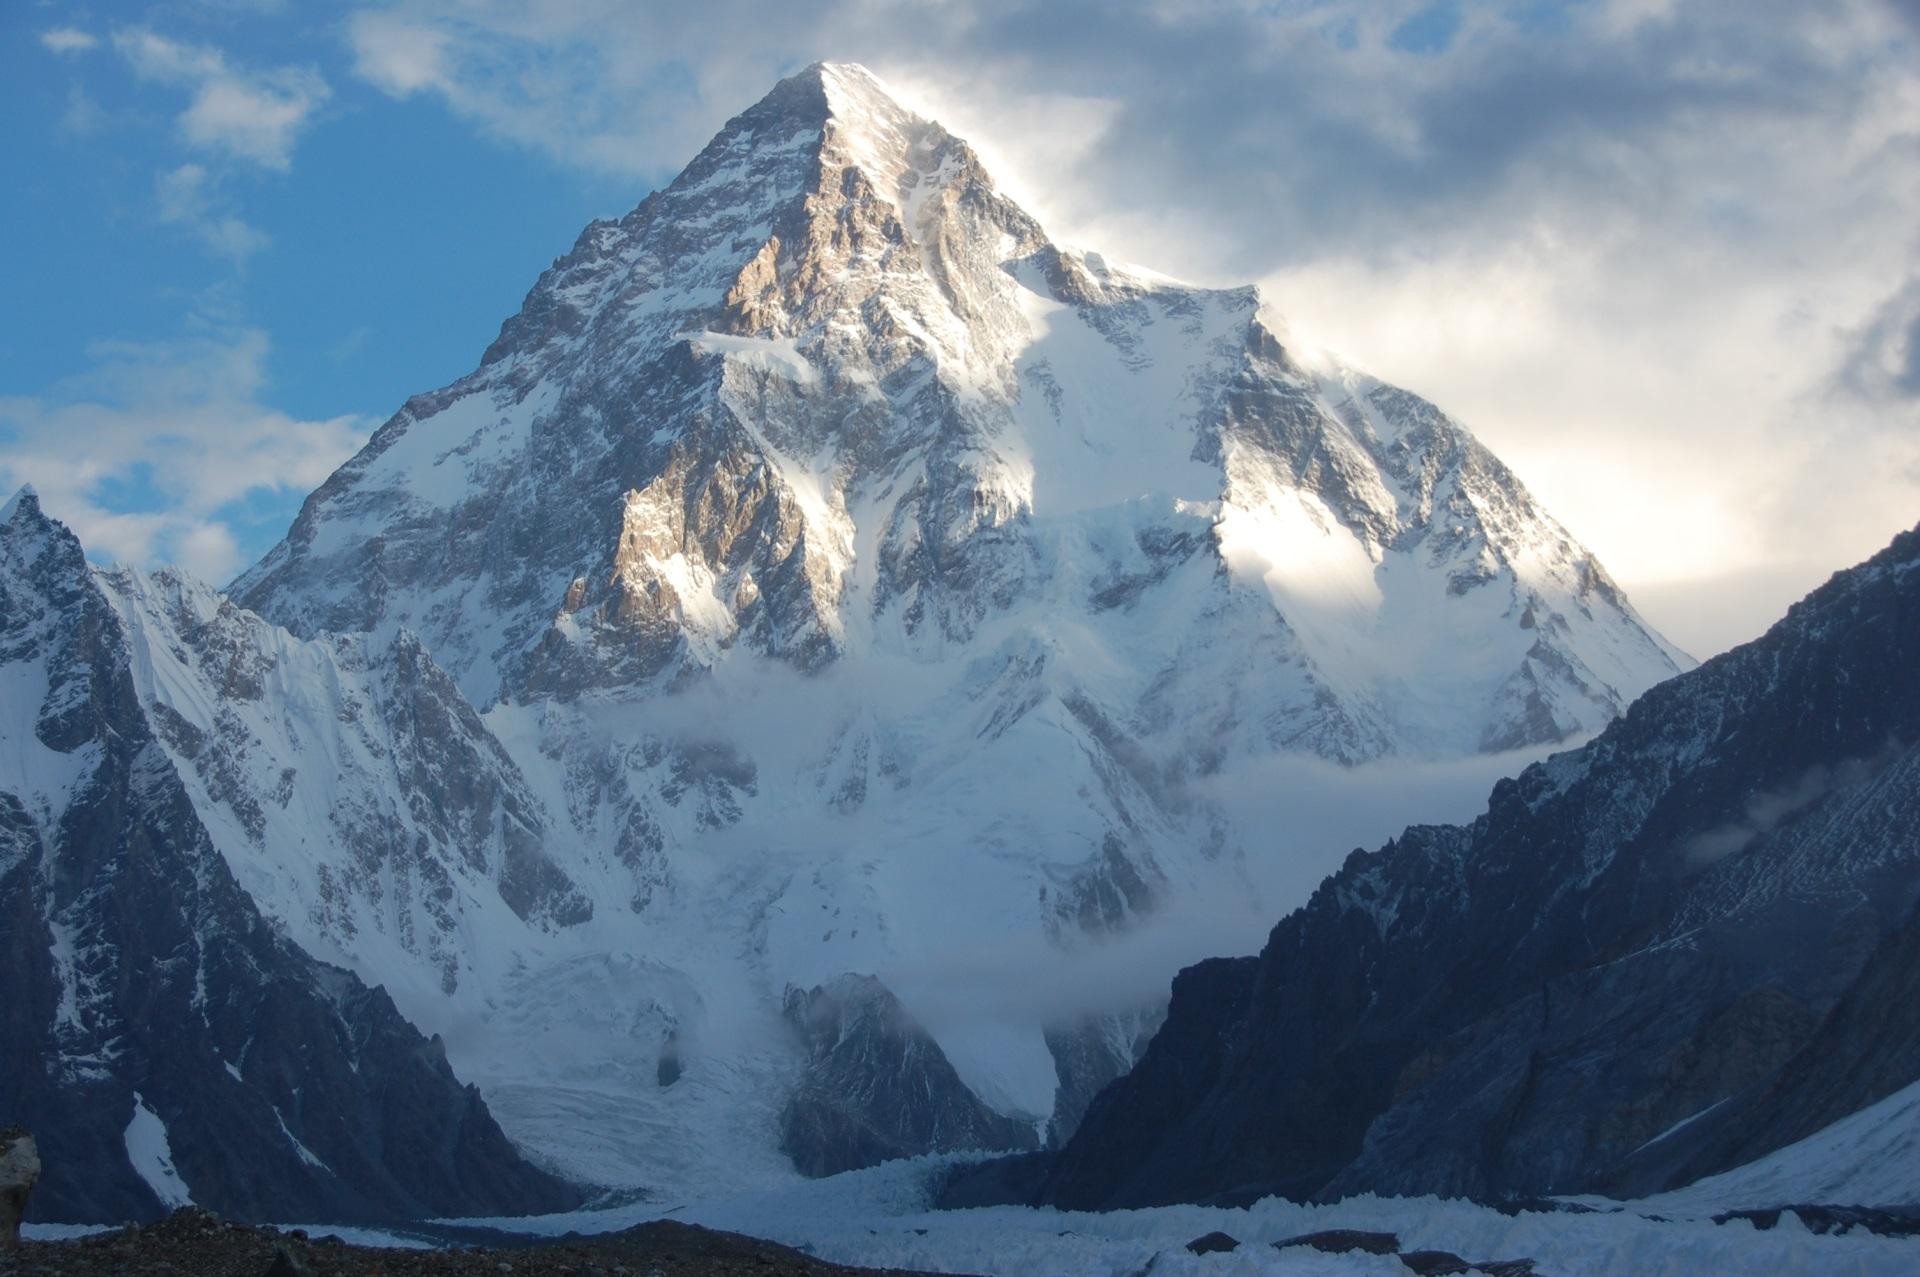 Photo: K2, Mount Godwin Austen, Chogori, Savage Mountain (Wikipedia) - A mountain of data